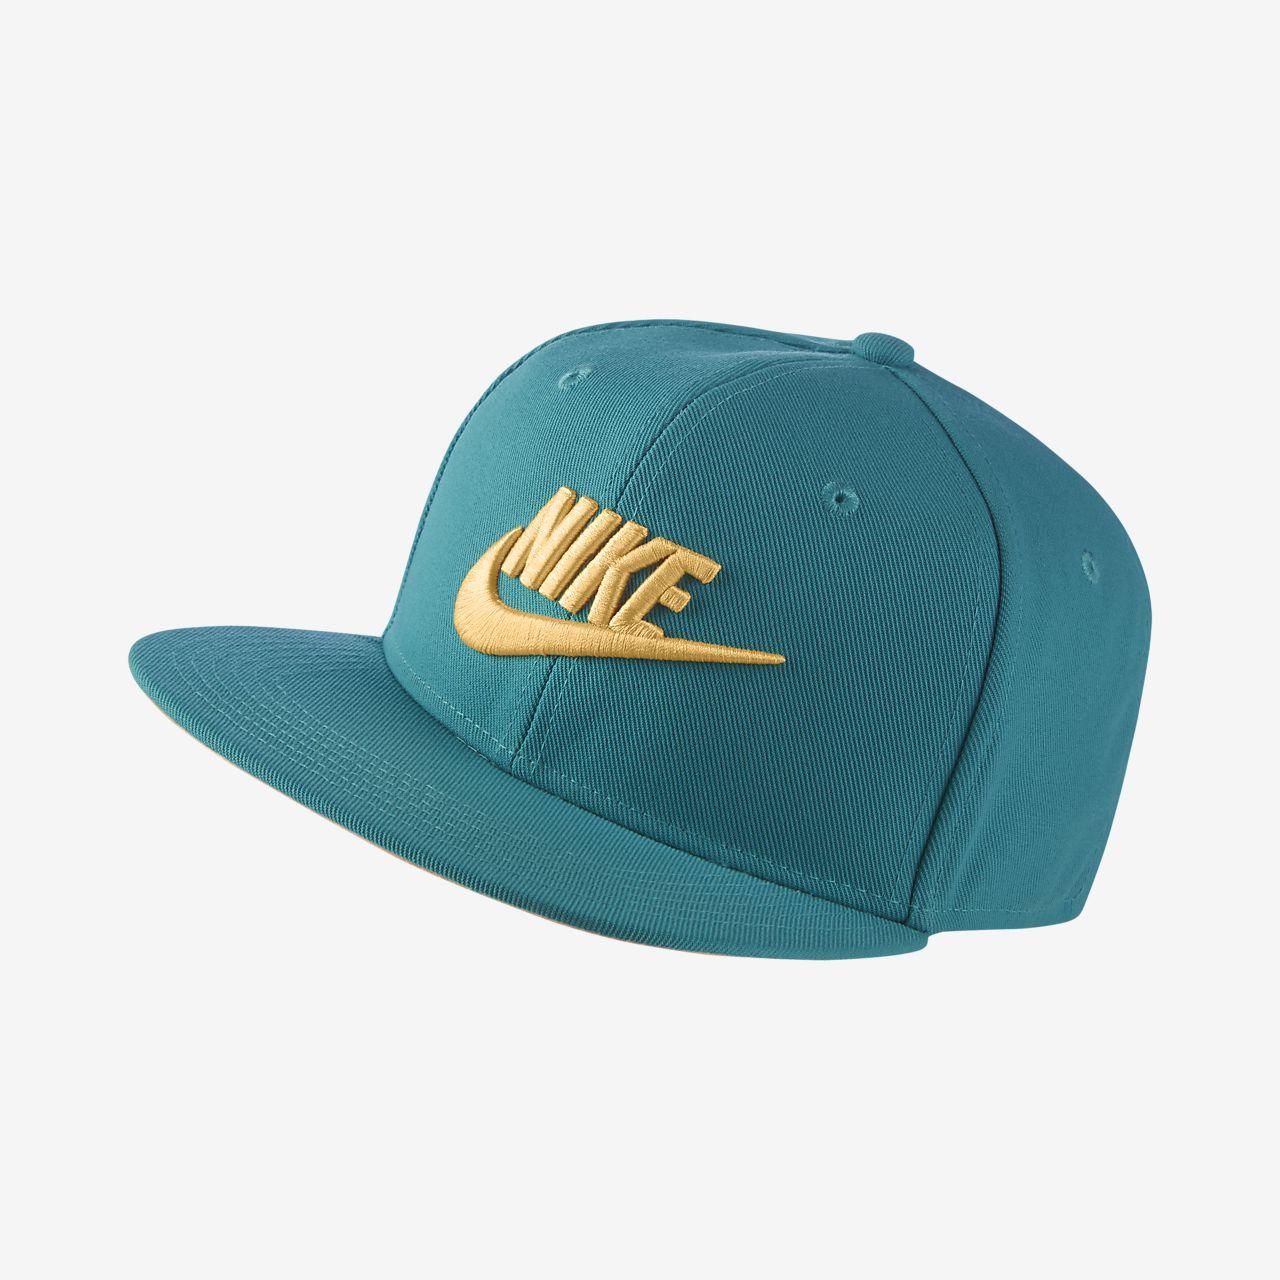 808e54049d Cappello regolabile Nike Pro - Bambini. Nike.com CH